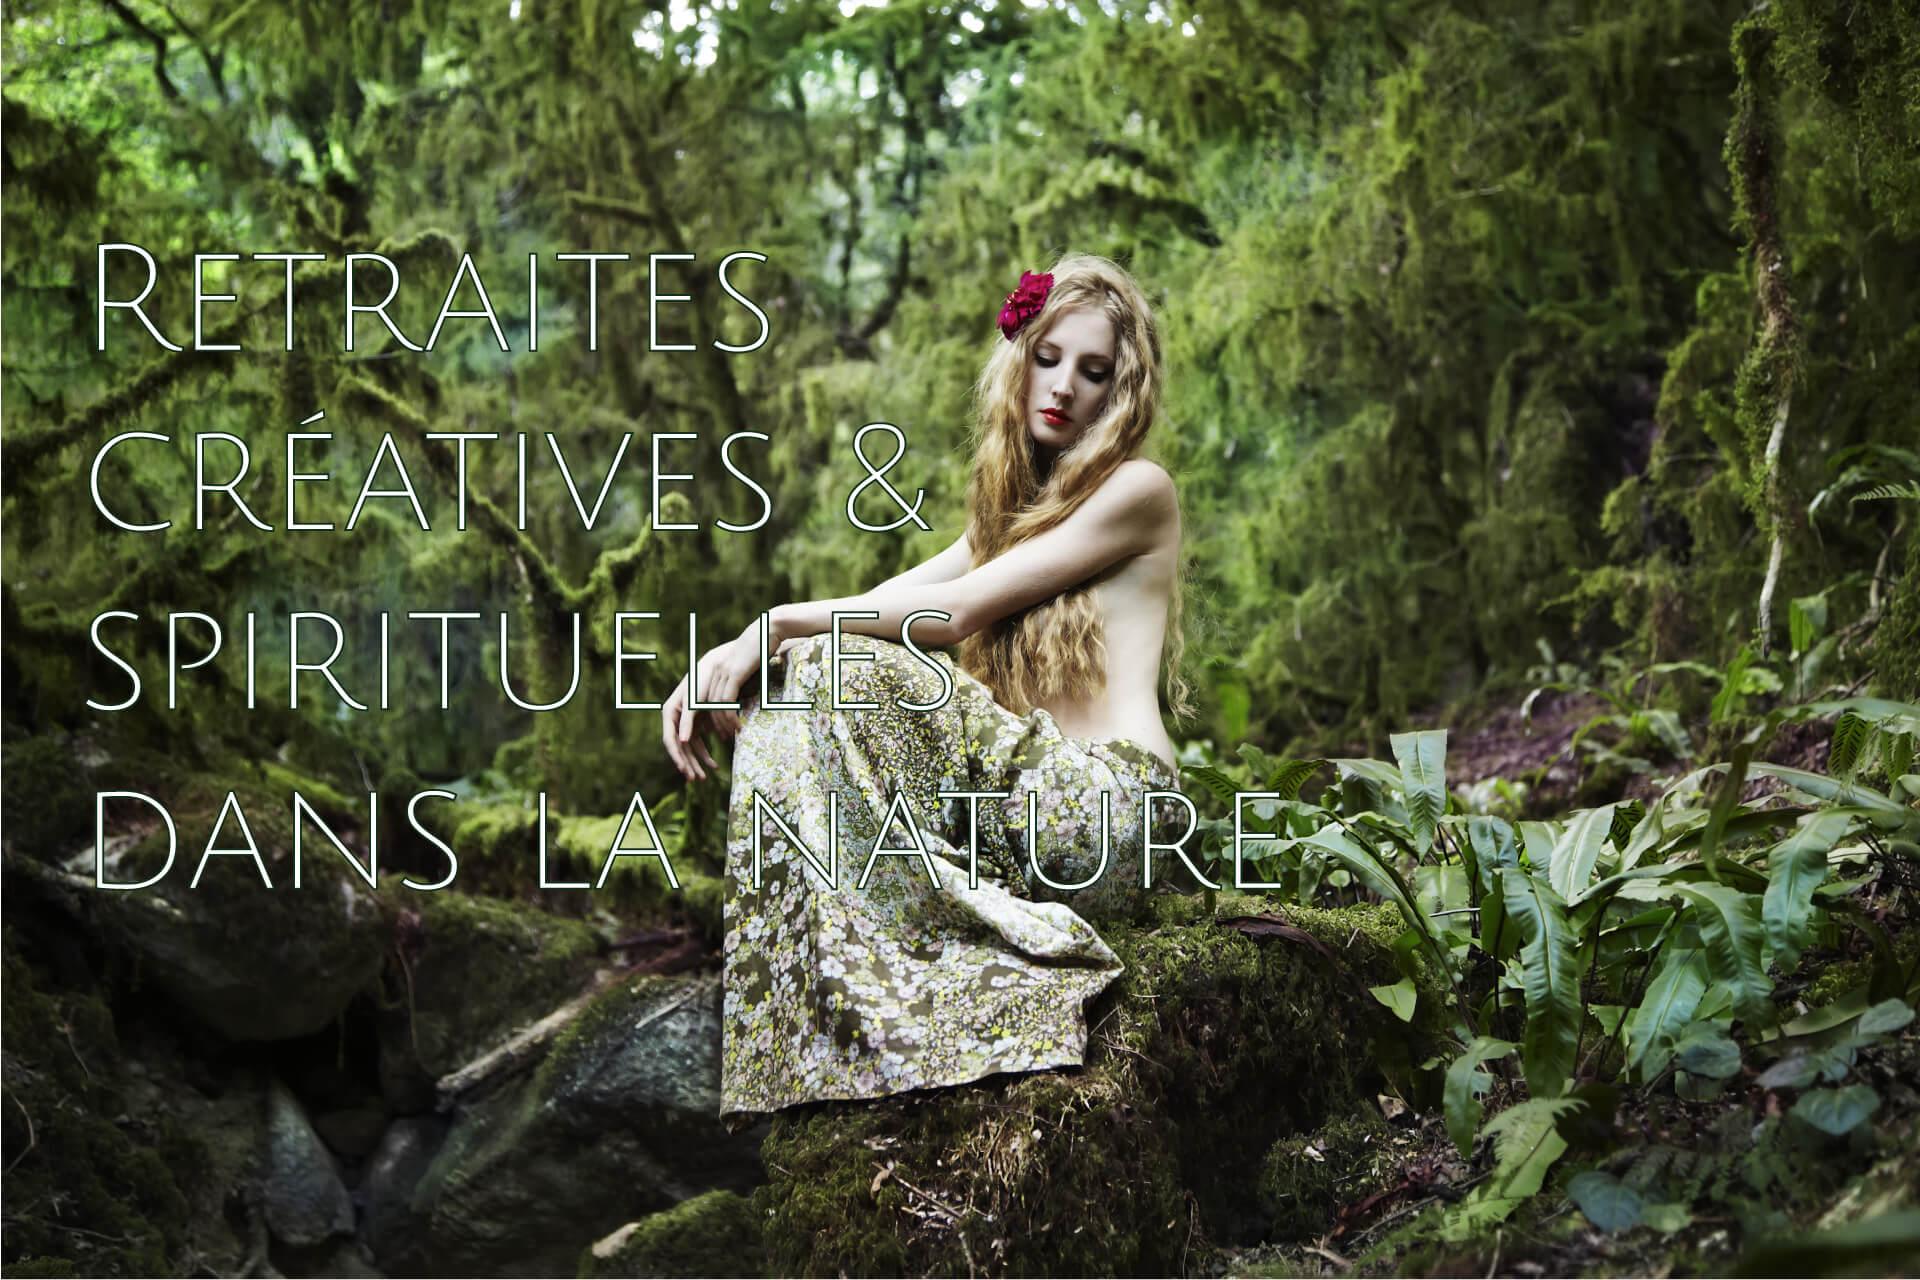 Retraites créatives et spirituelles dans la nature   Creativity, Nature, Spirit Retreats   TheReturn.ca